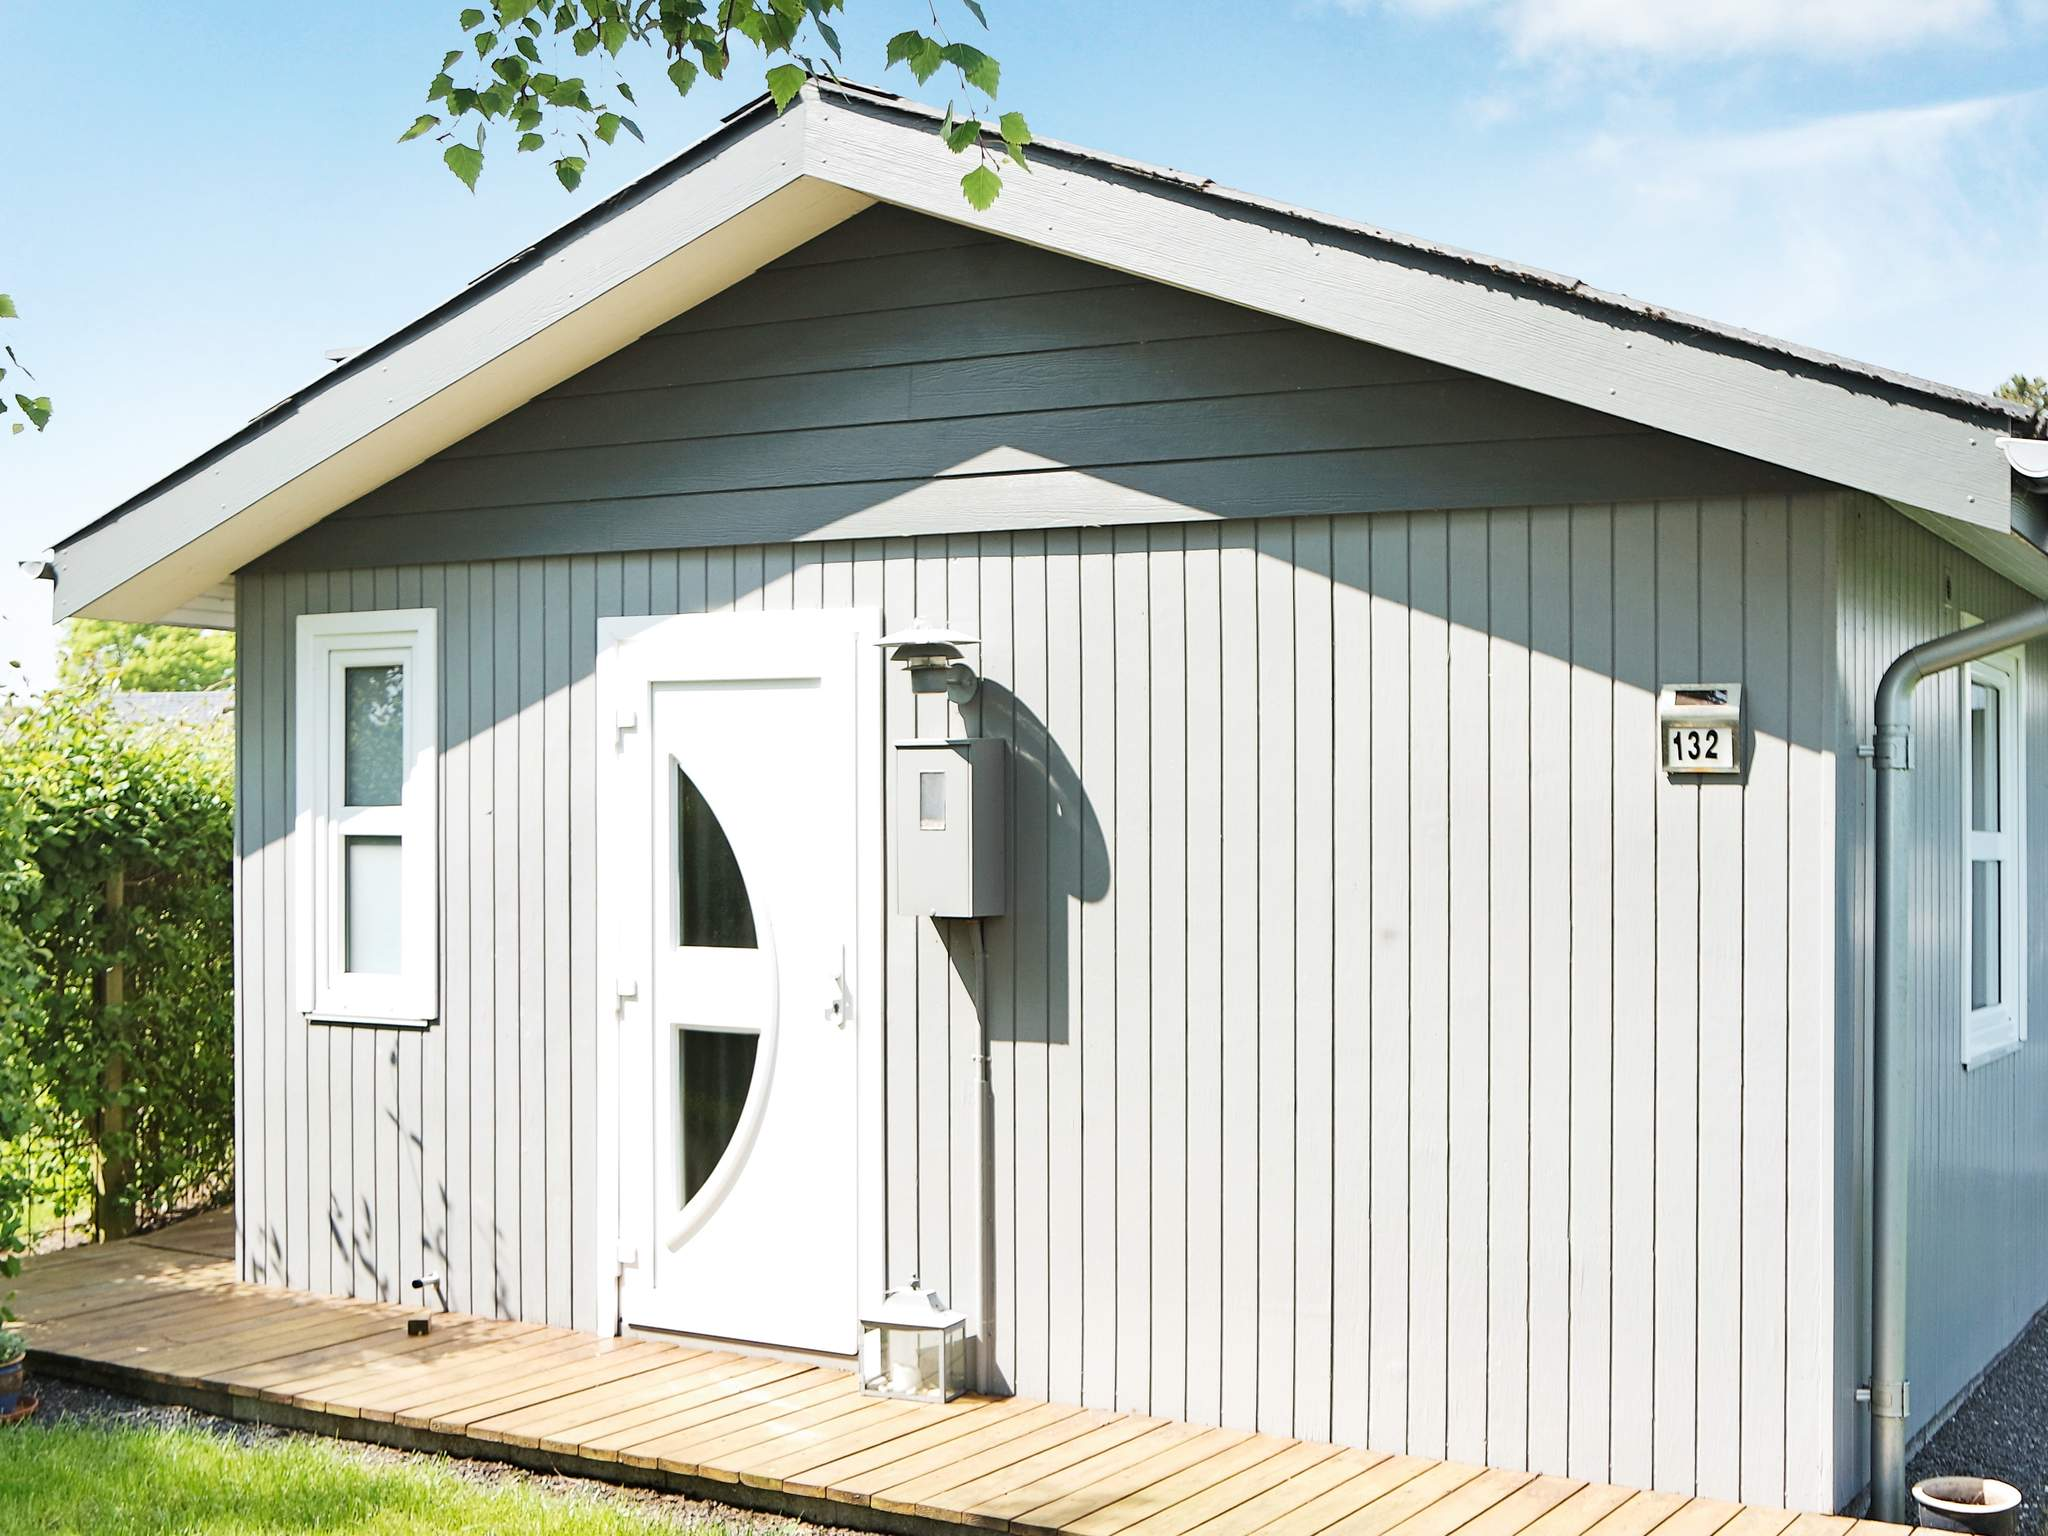 Ferienhaus Øster Hurup (85519), Øster Hurup, , Ostjütland, Dänemark, Bild 13